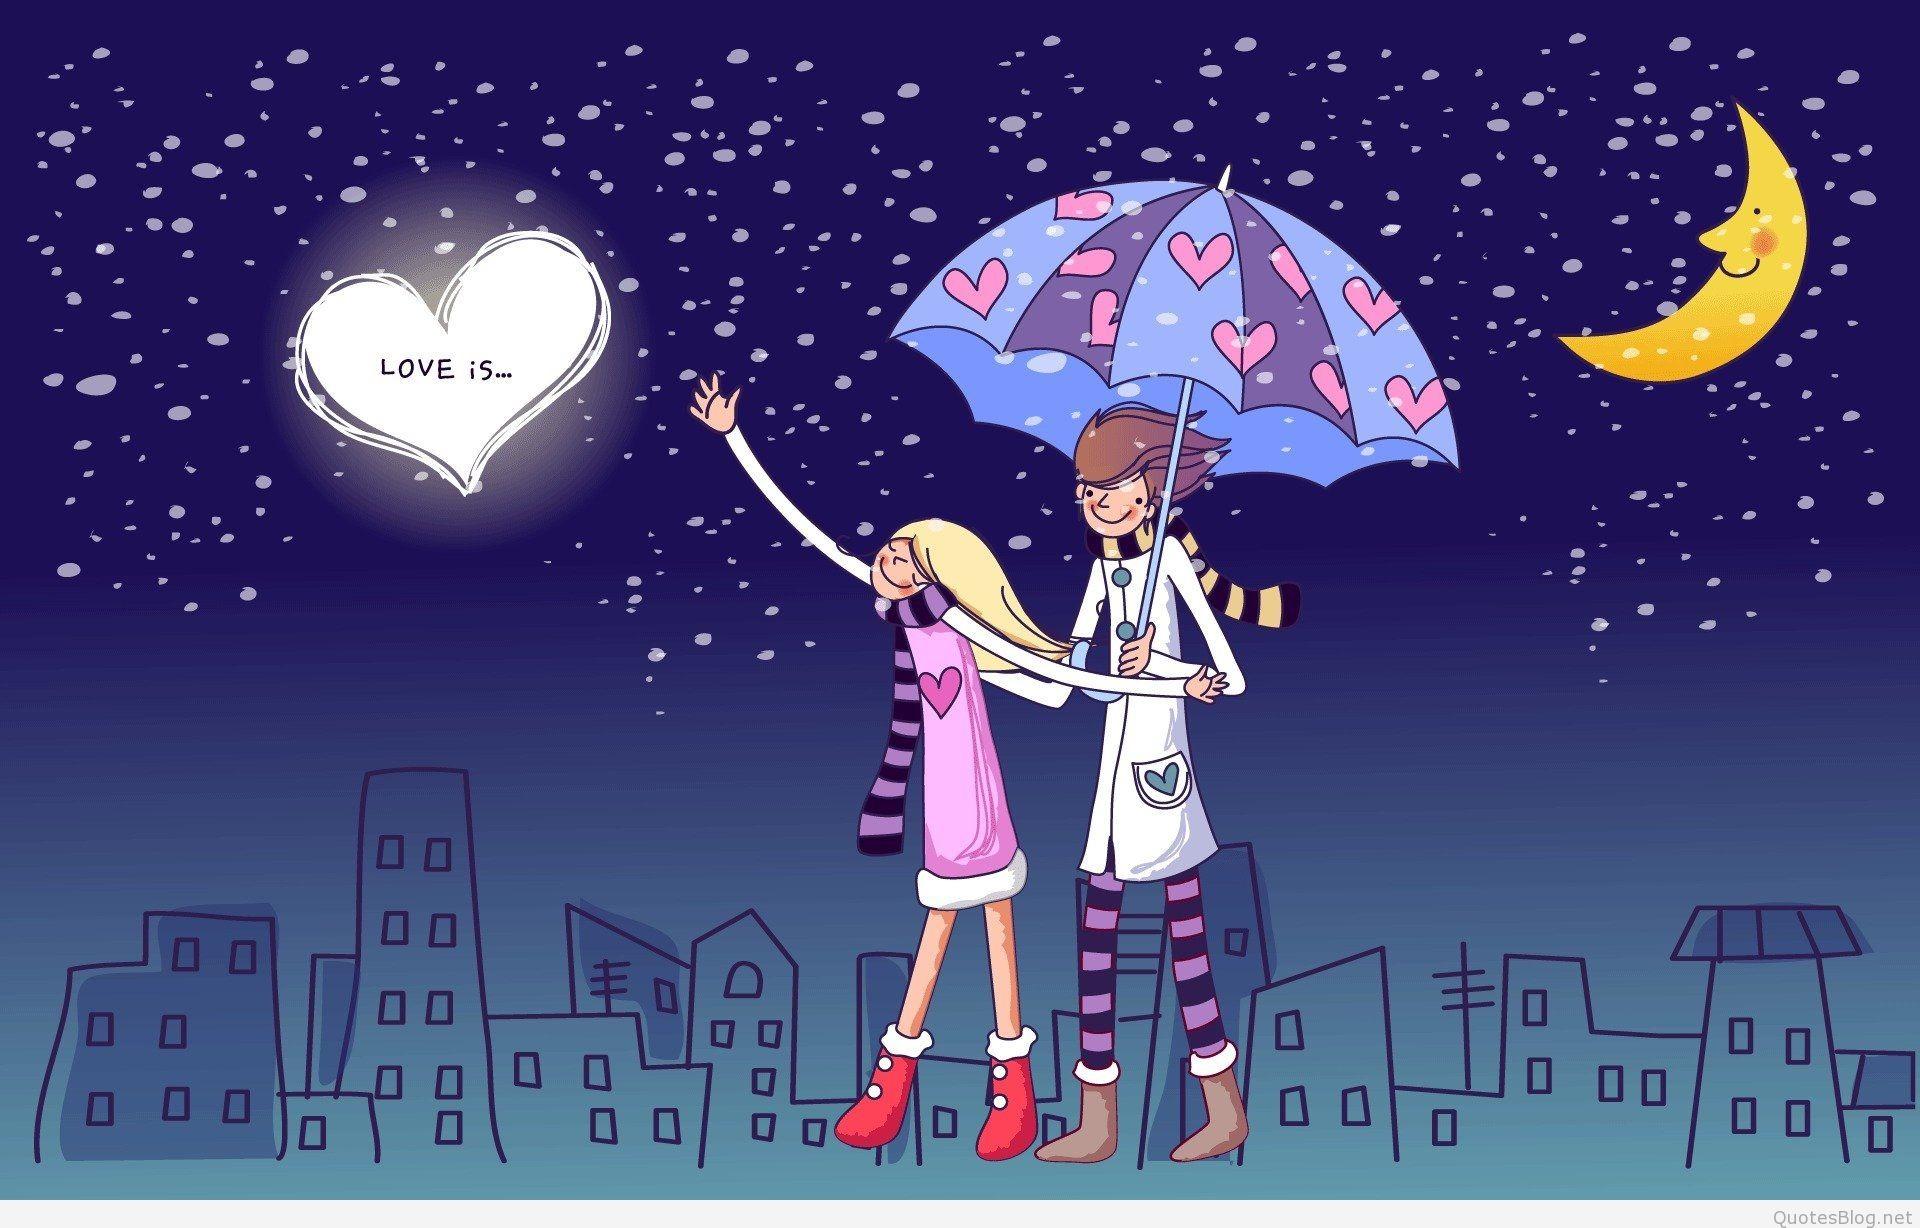 wallpapers-love-couple-couples-valentine-rain